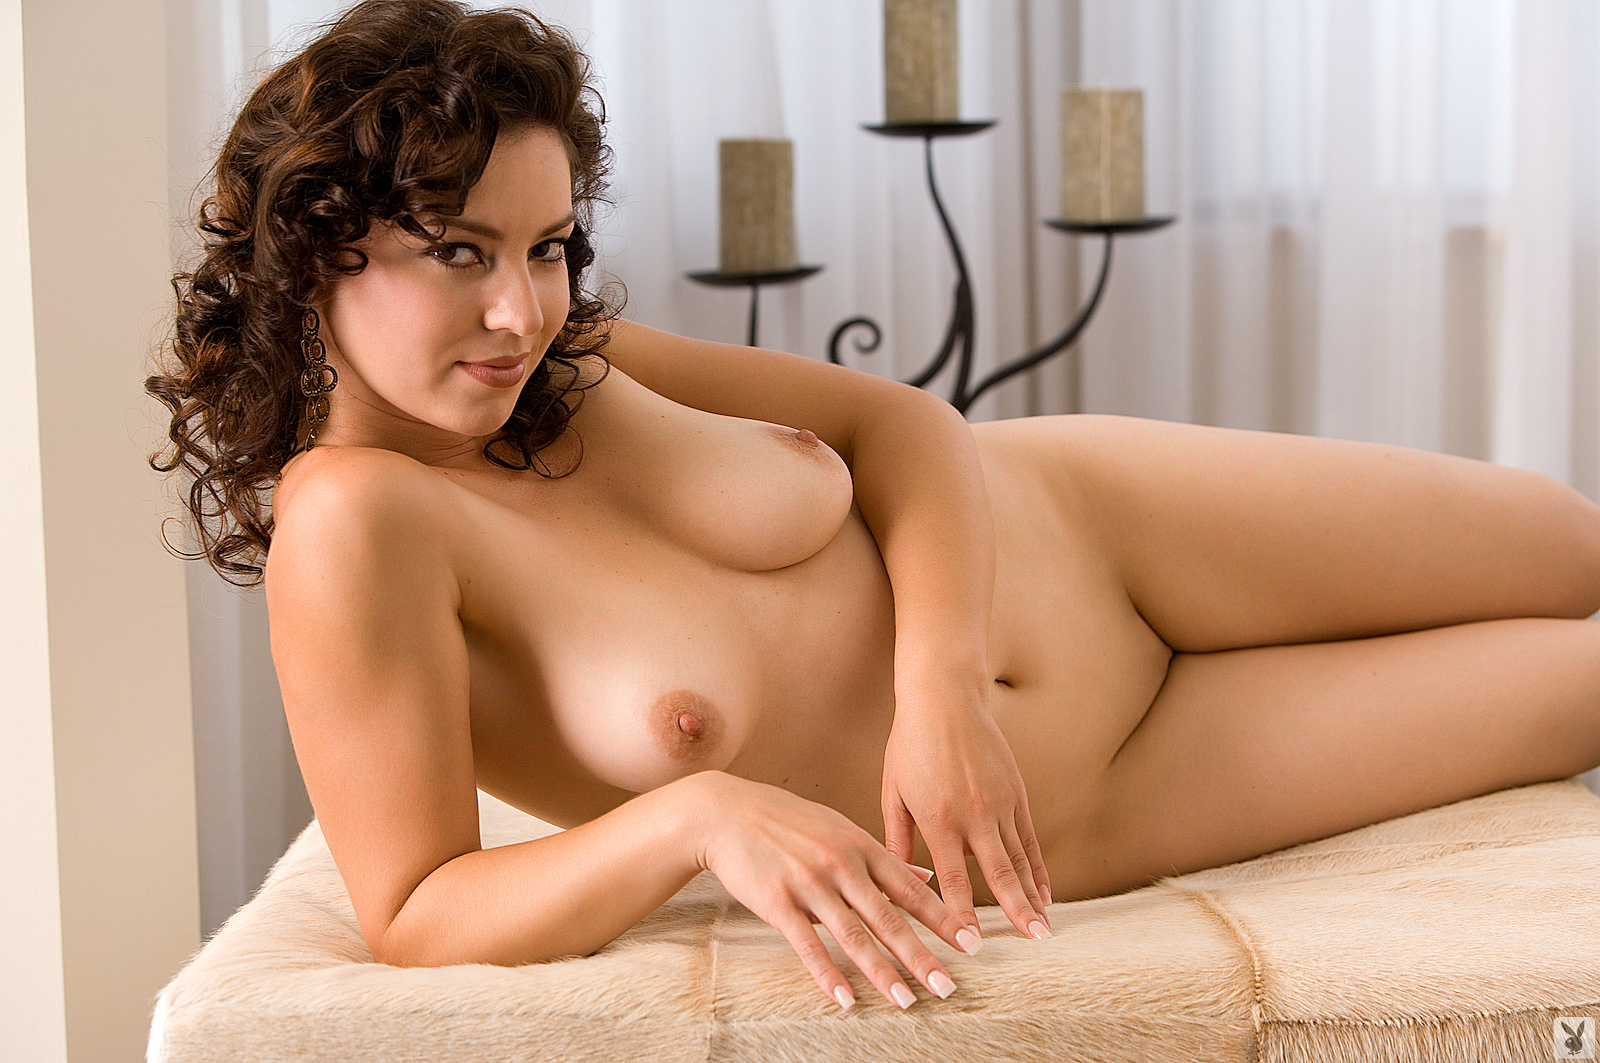 kim kardishian porno video big cock